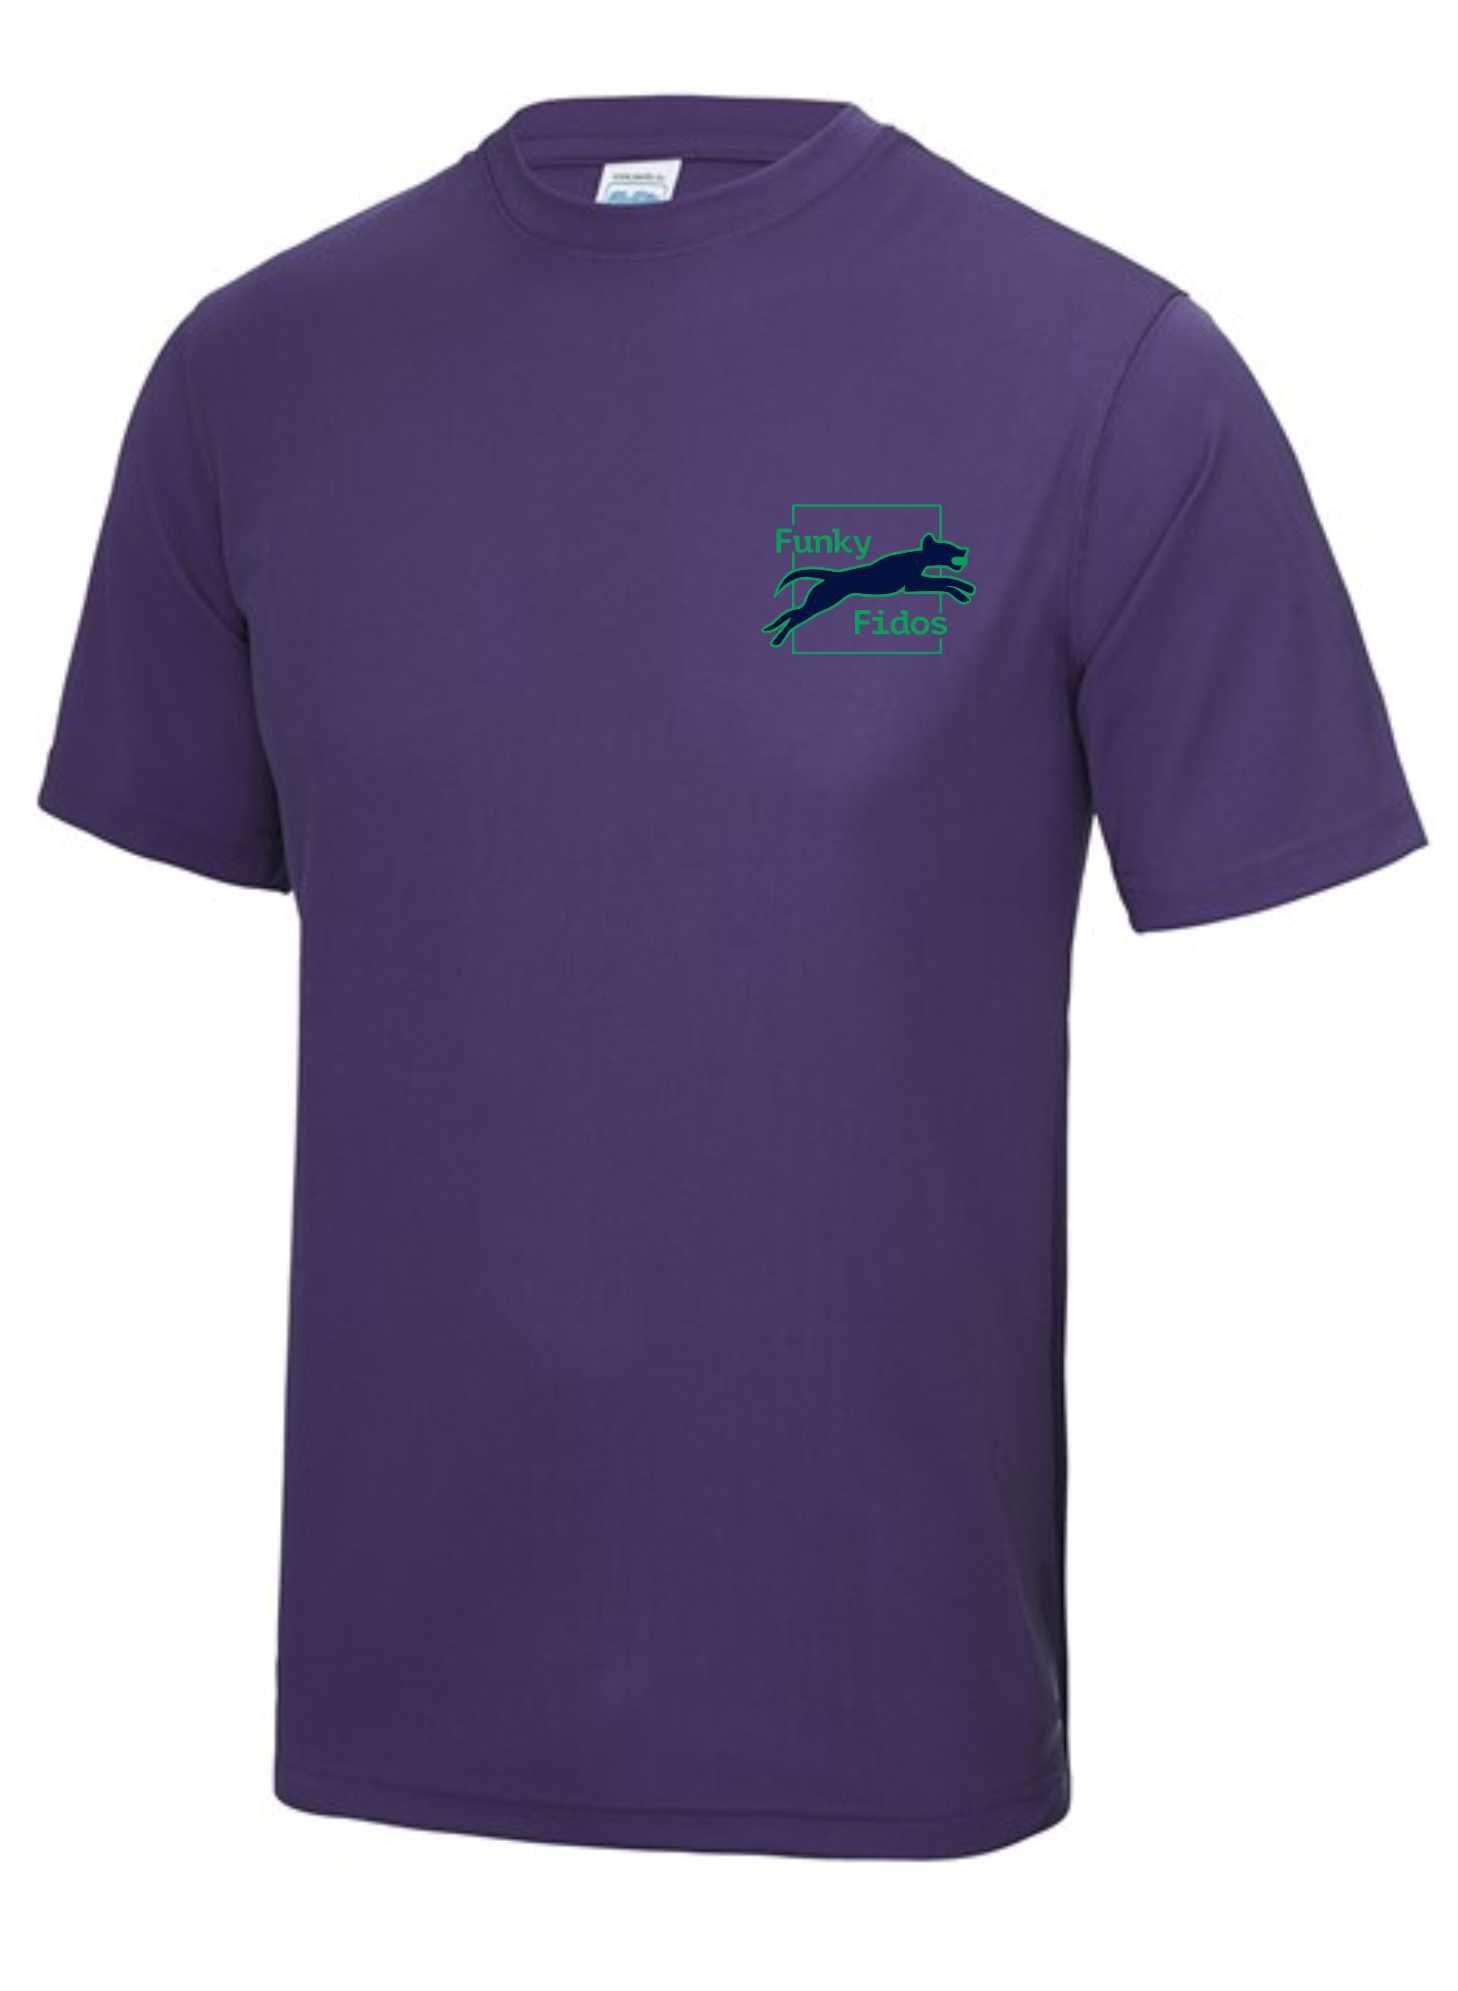 Funky Fidos – AWD Men's Cool Tee (Purple)